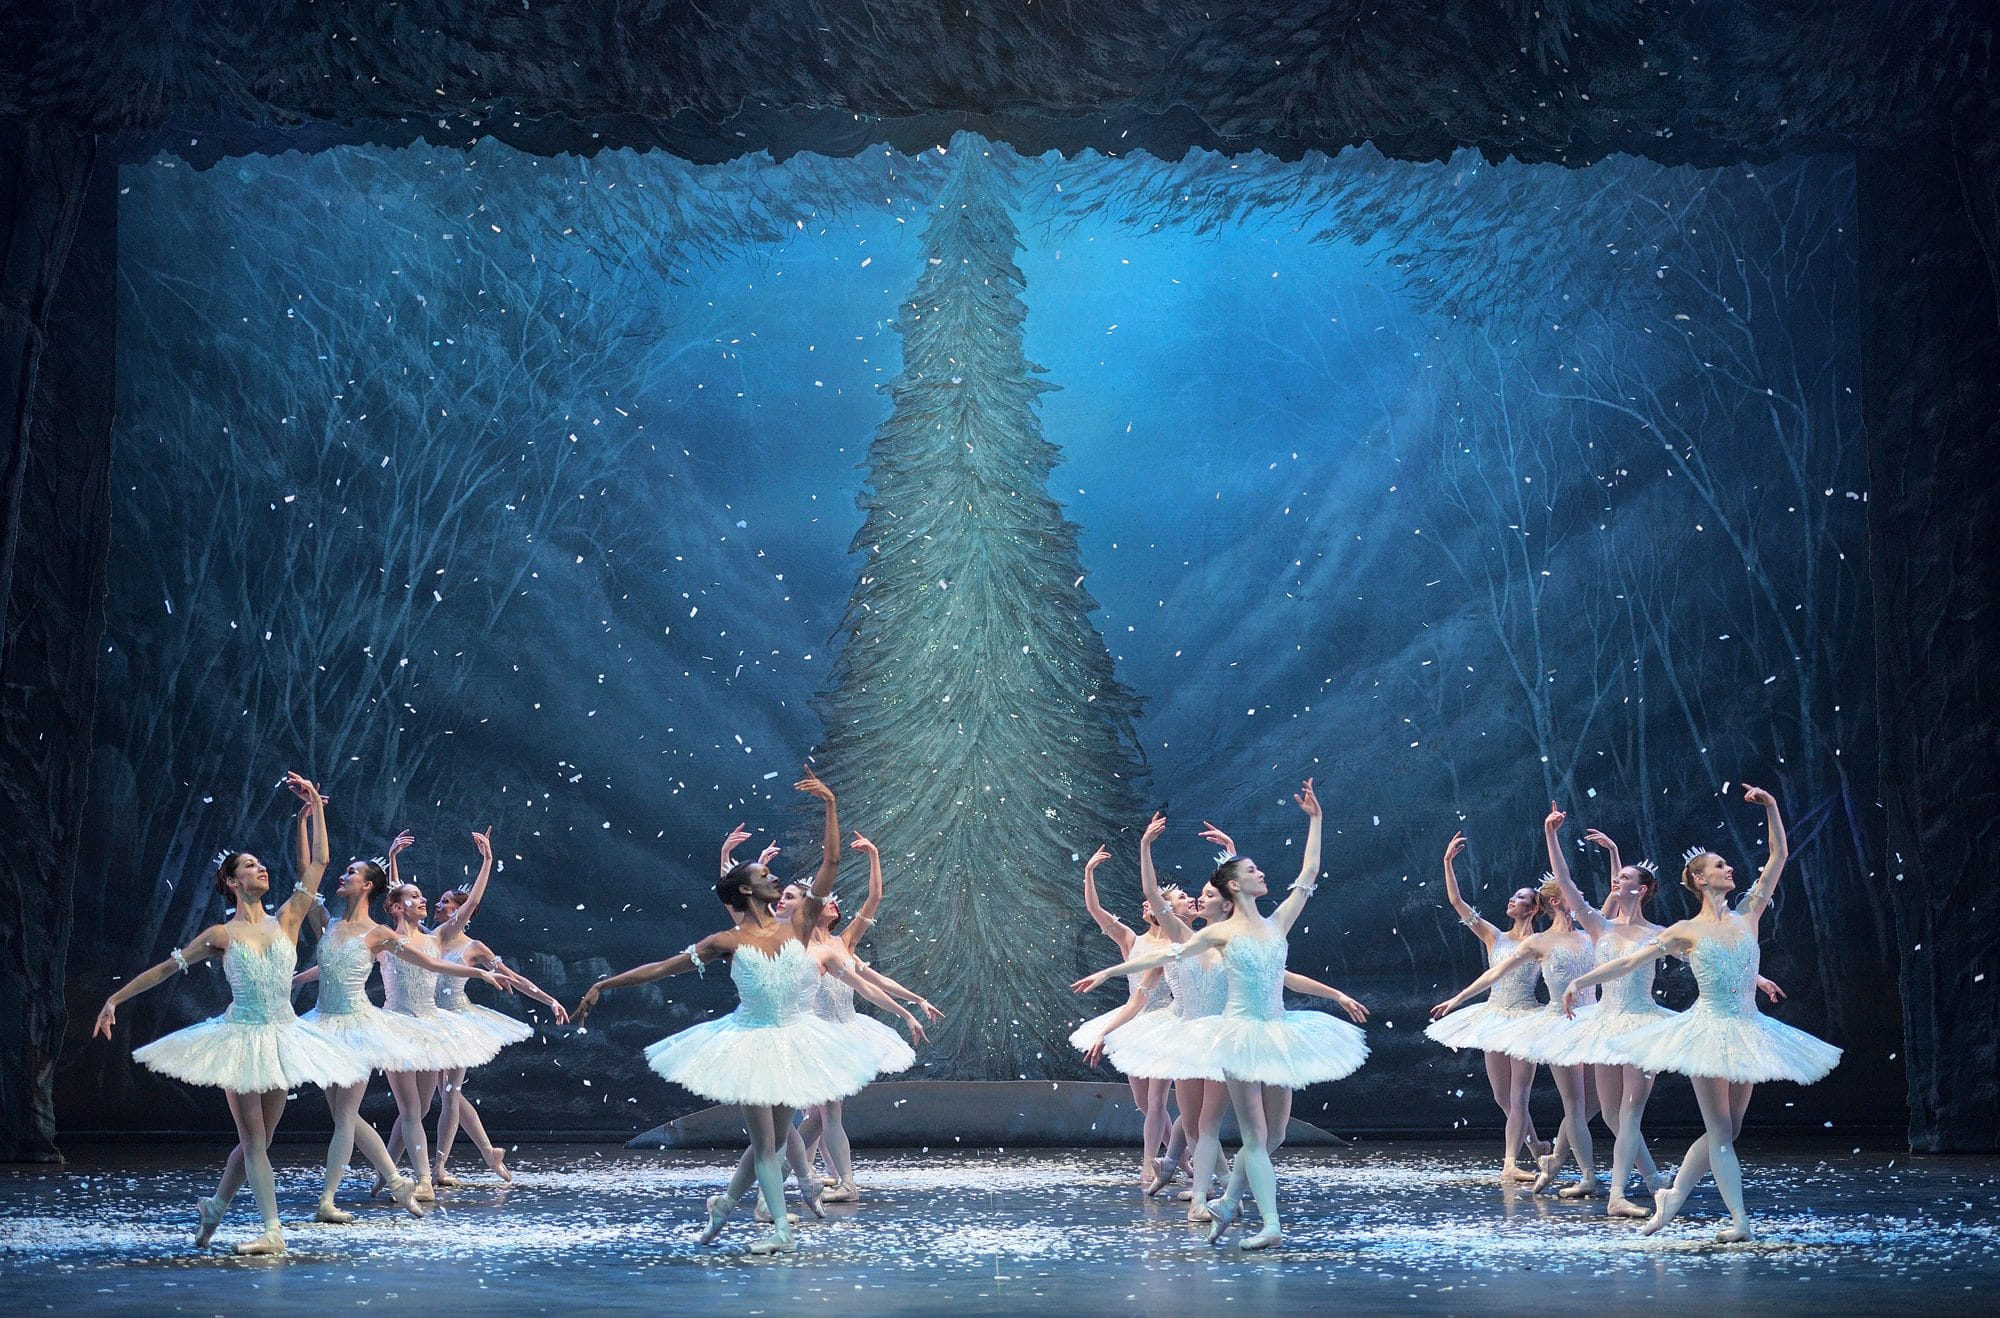 Ballerinas perform The Nutcracker on stage